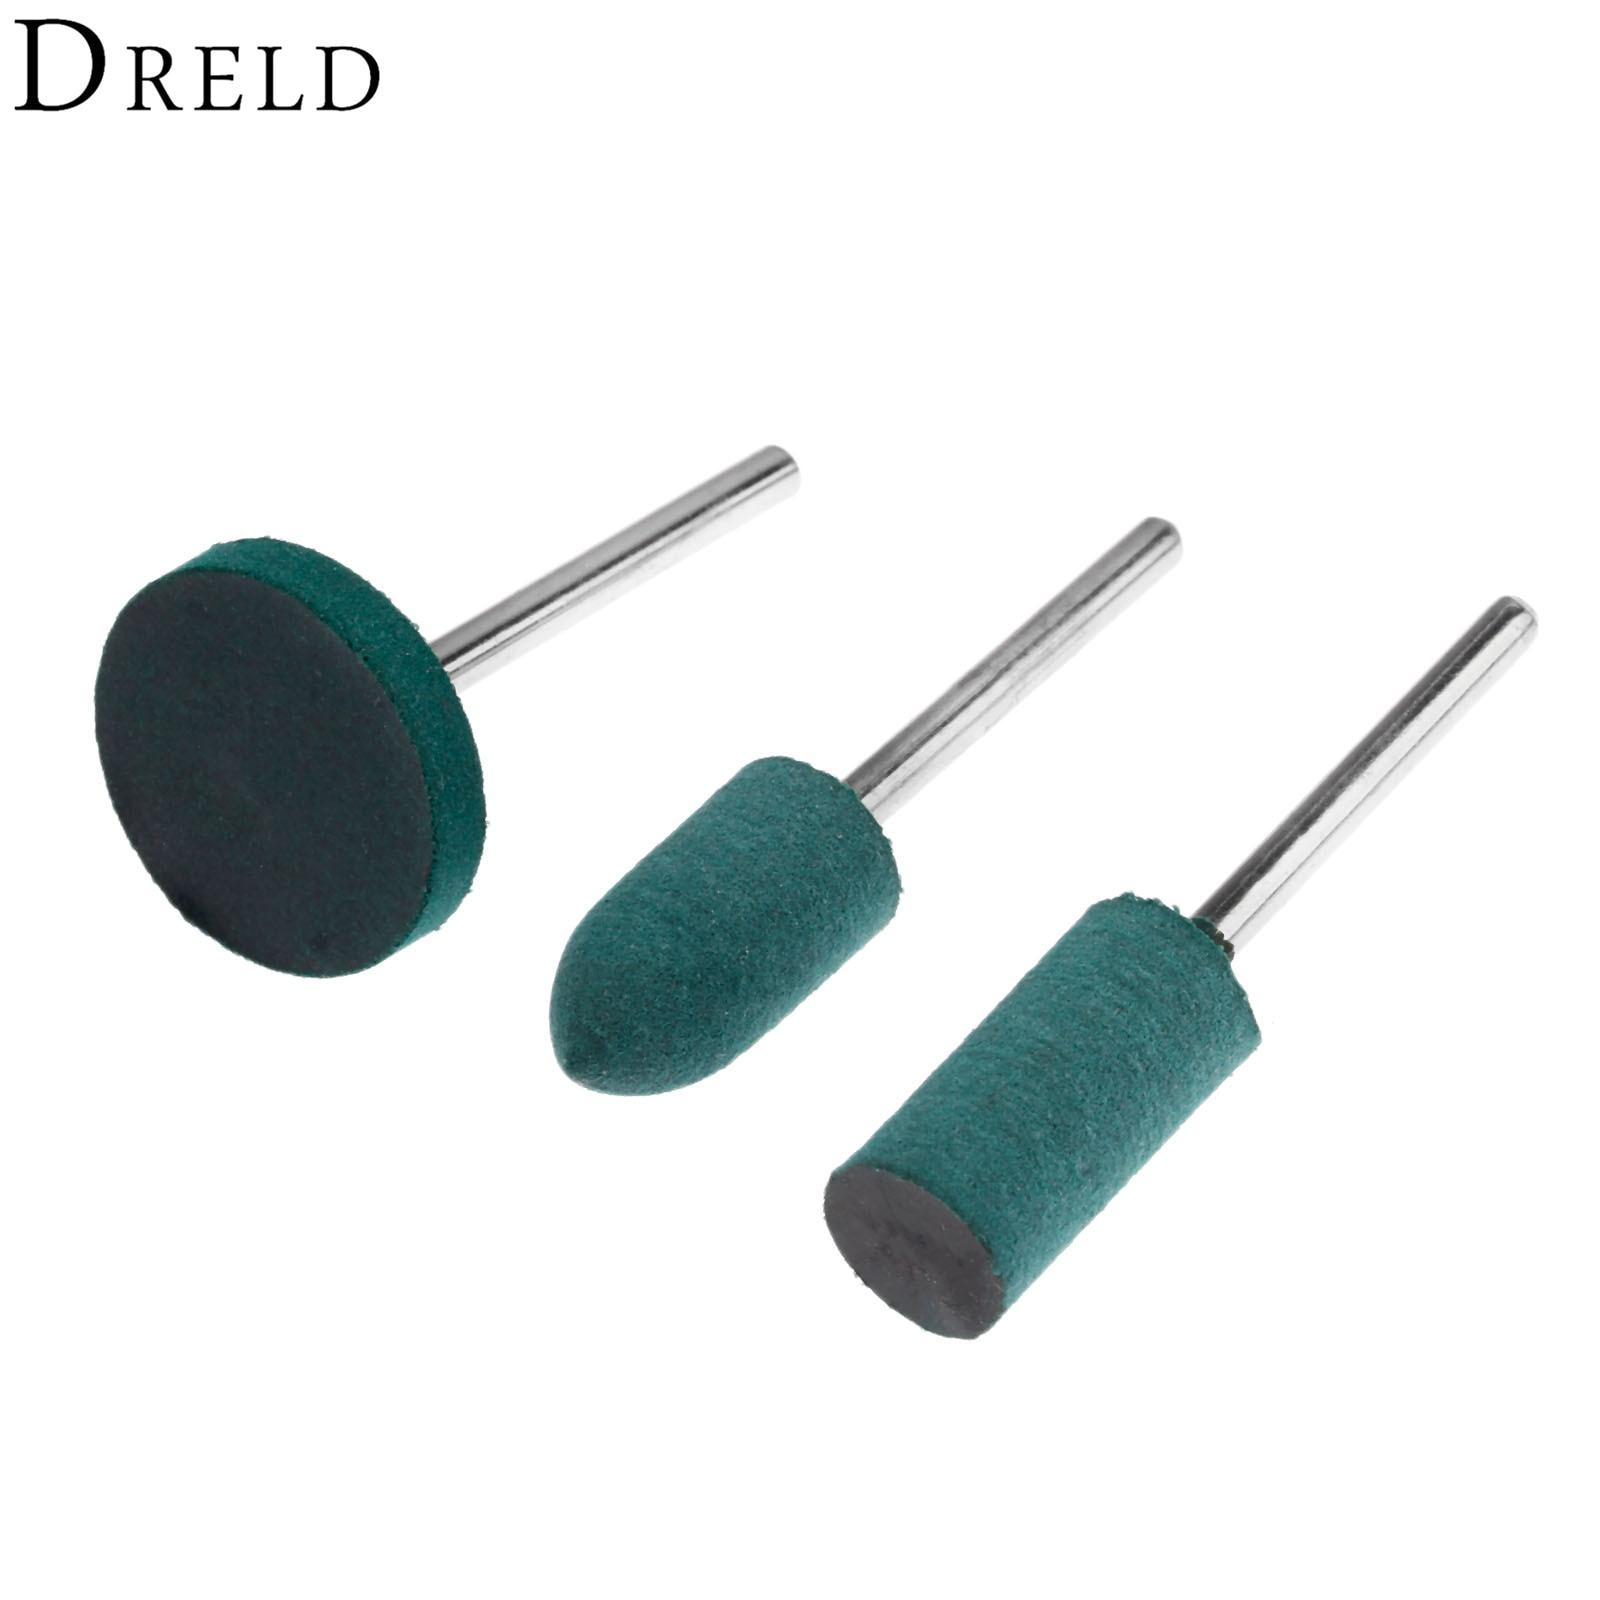 5MM Diameter 10PCS 2.35MM Shank Cylinder Shape Sponge Polishing Buffing Point Electric Drill